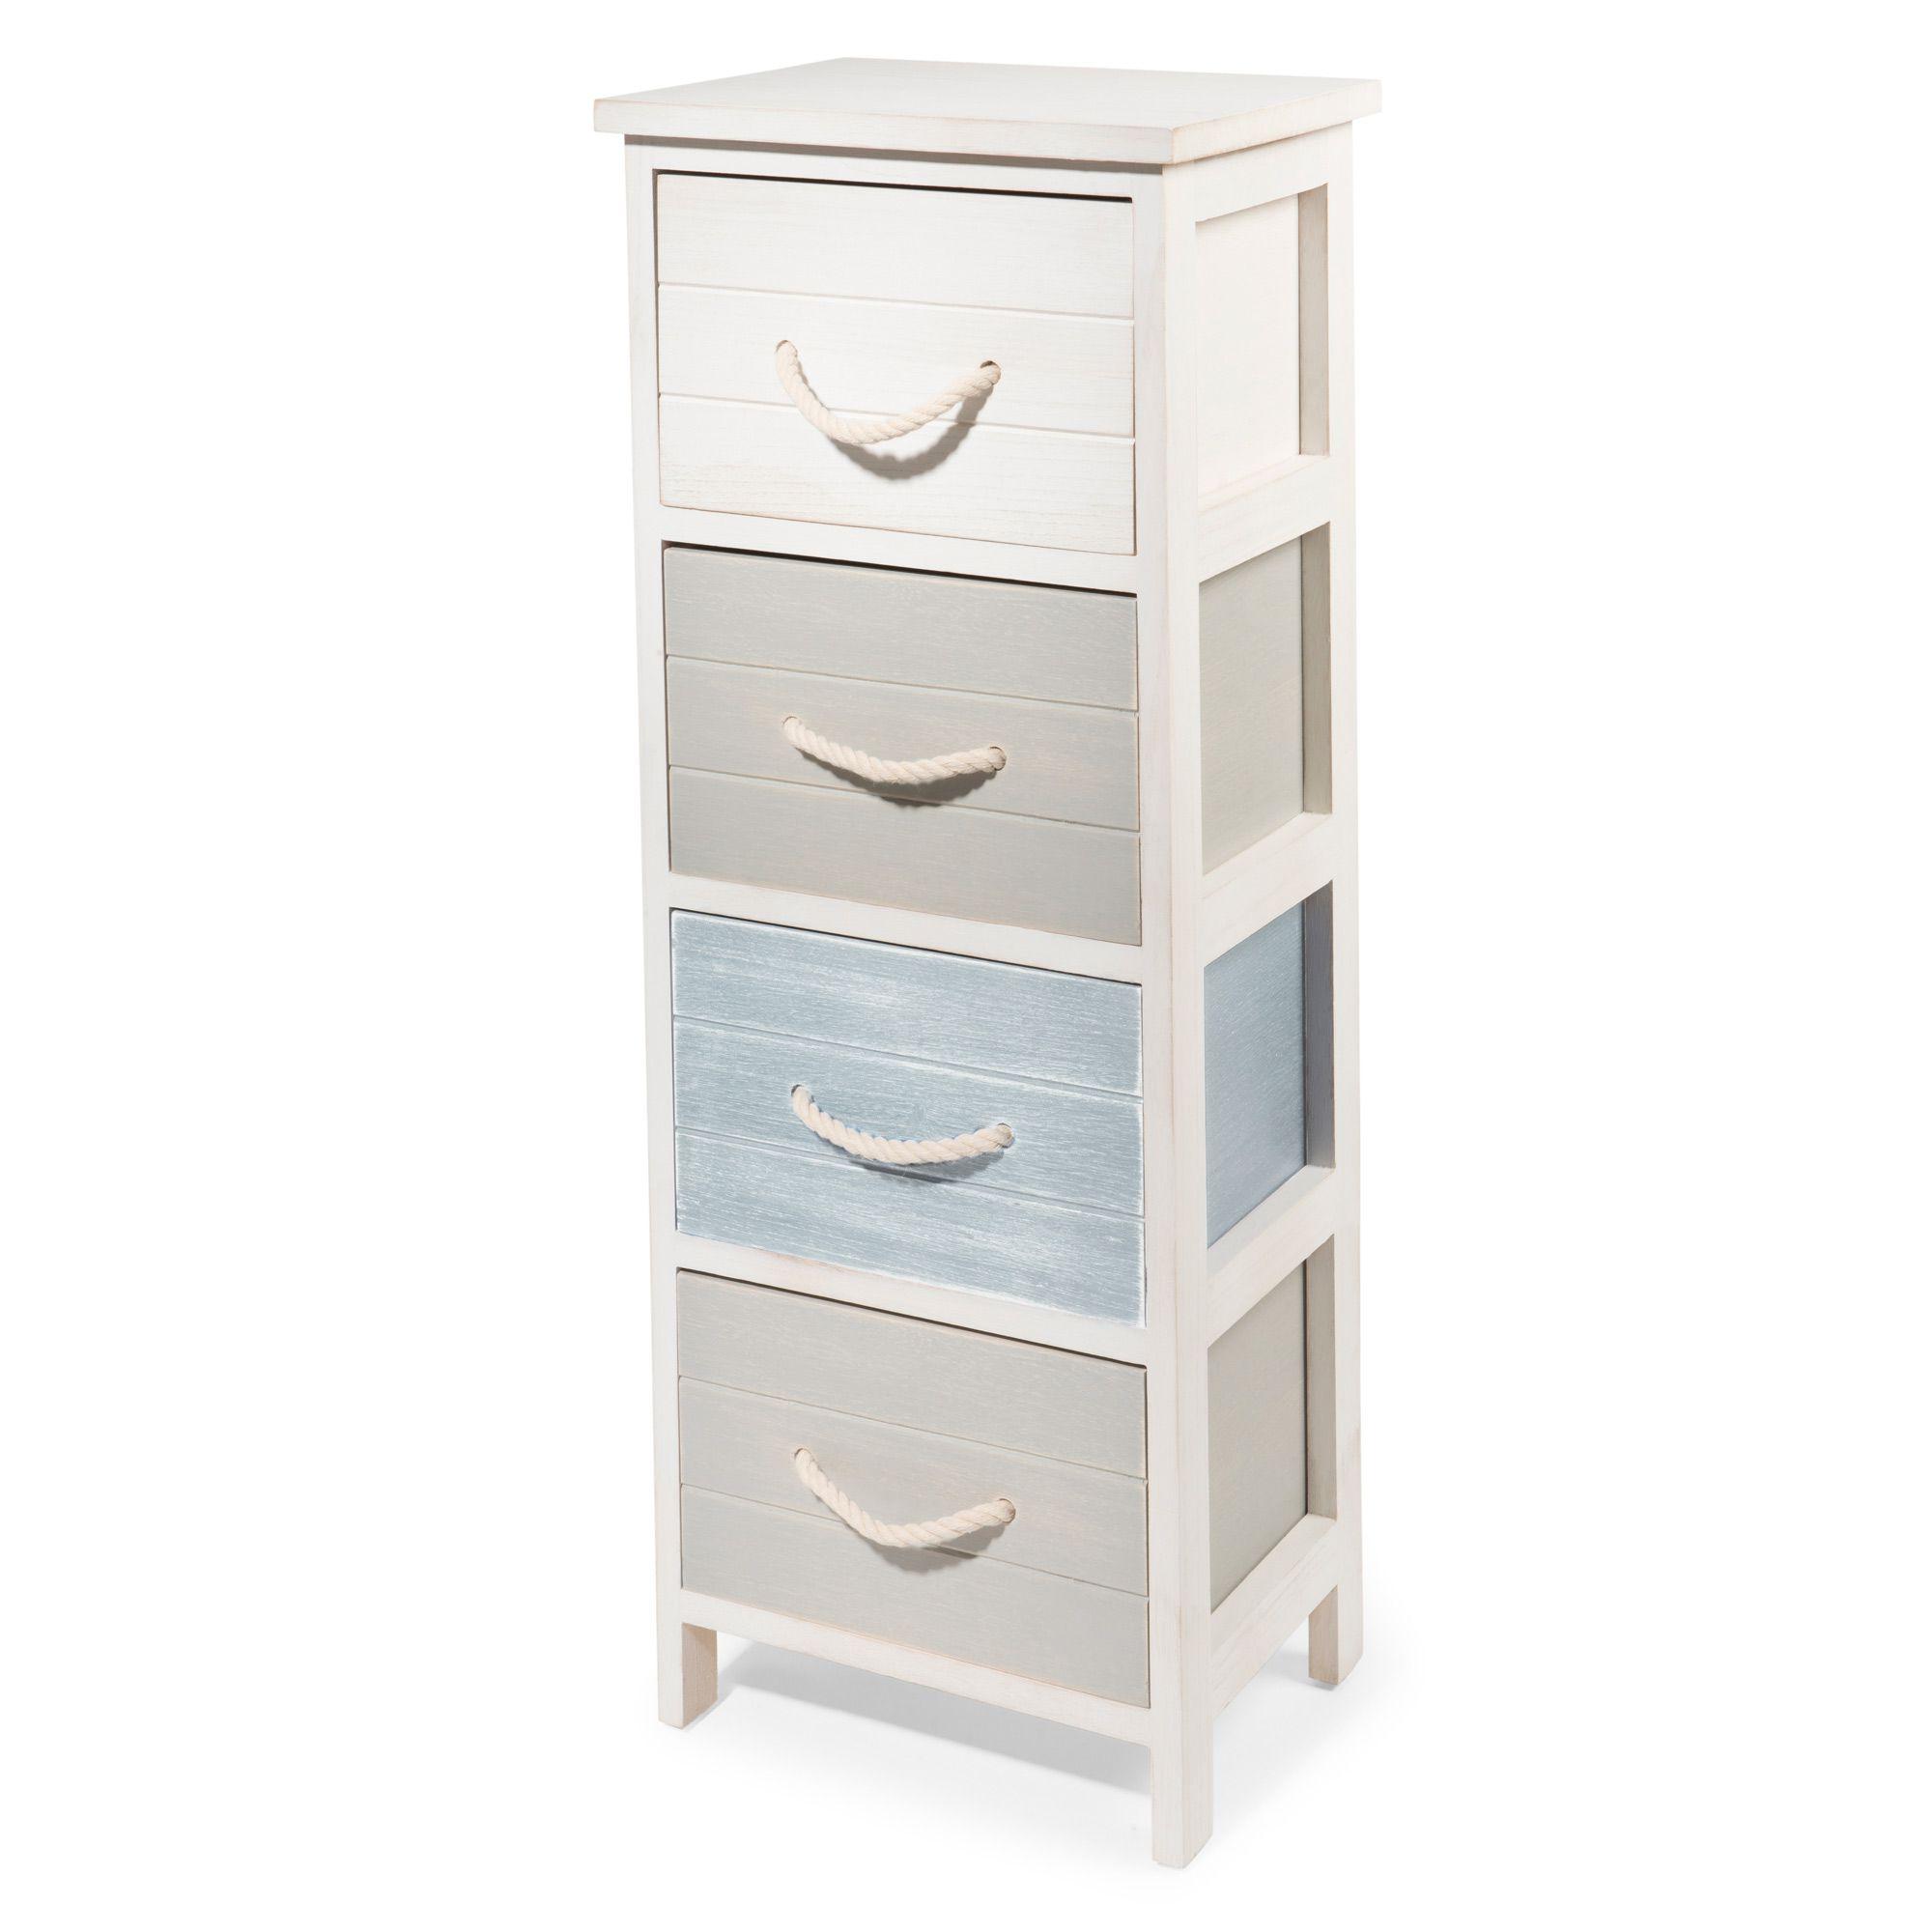 Mueble Cajones Gdd0 Mueble Pequeà O Con 4 Cajones De Paulonia Blanco Casa Pinterest